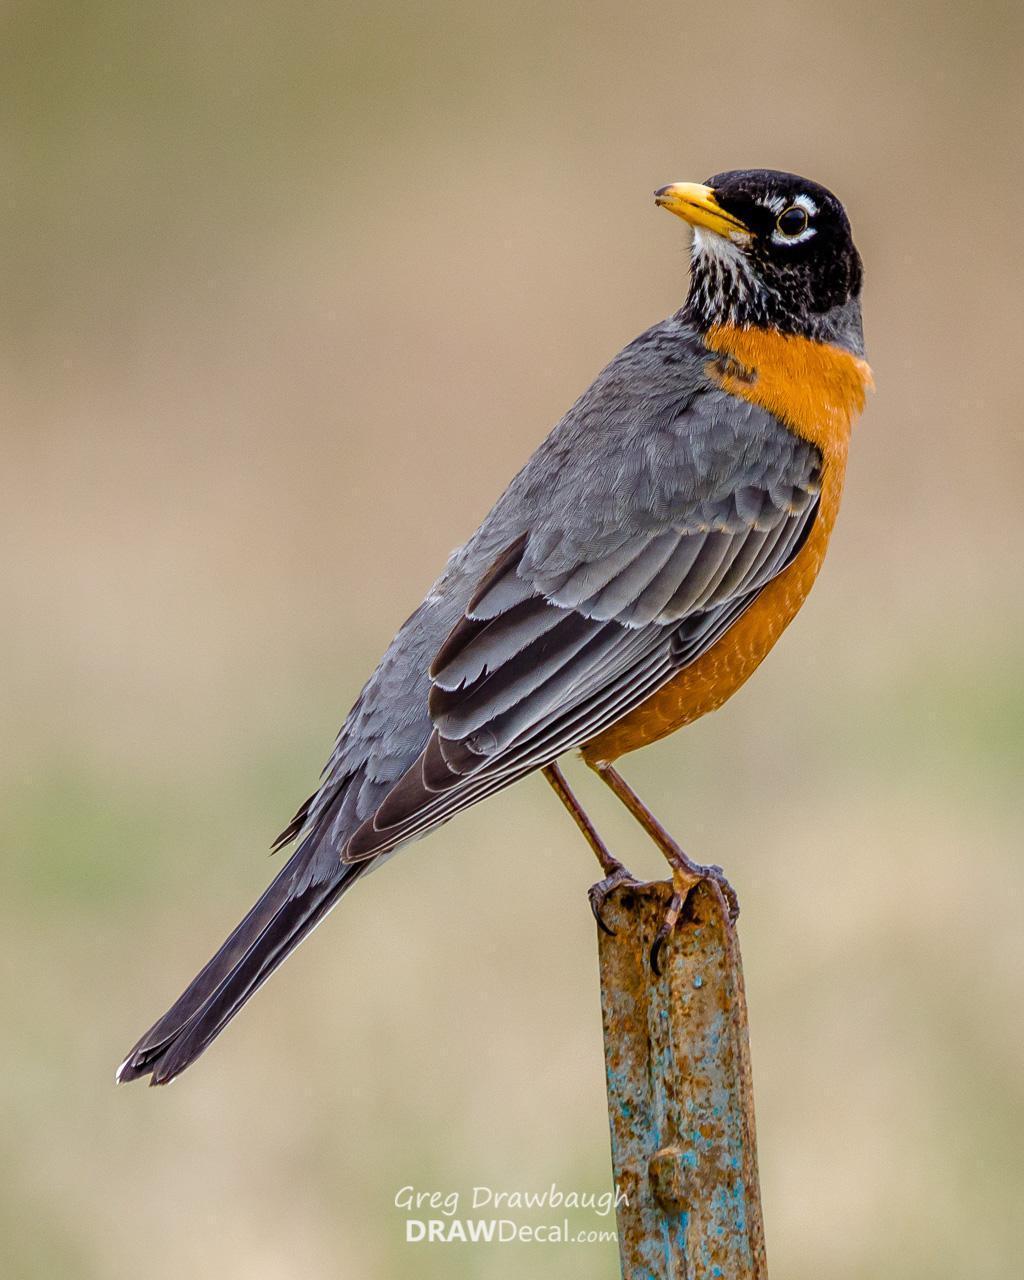 American Robin Photo by Greg Drawbaugh